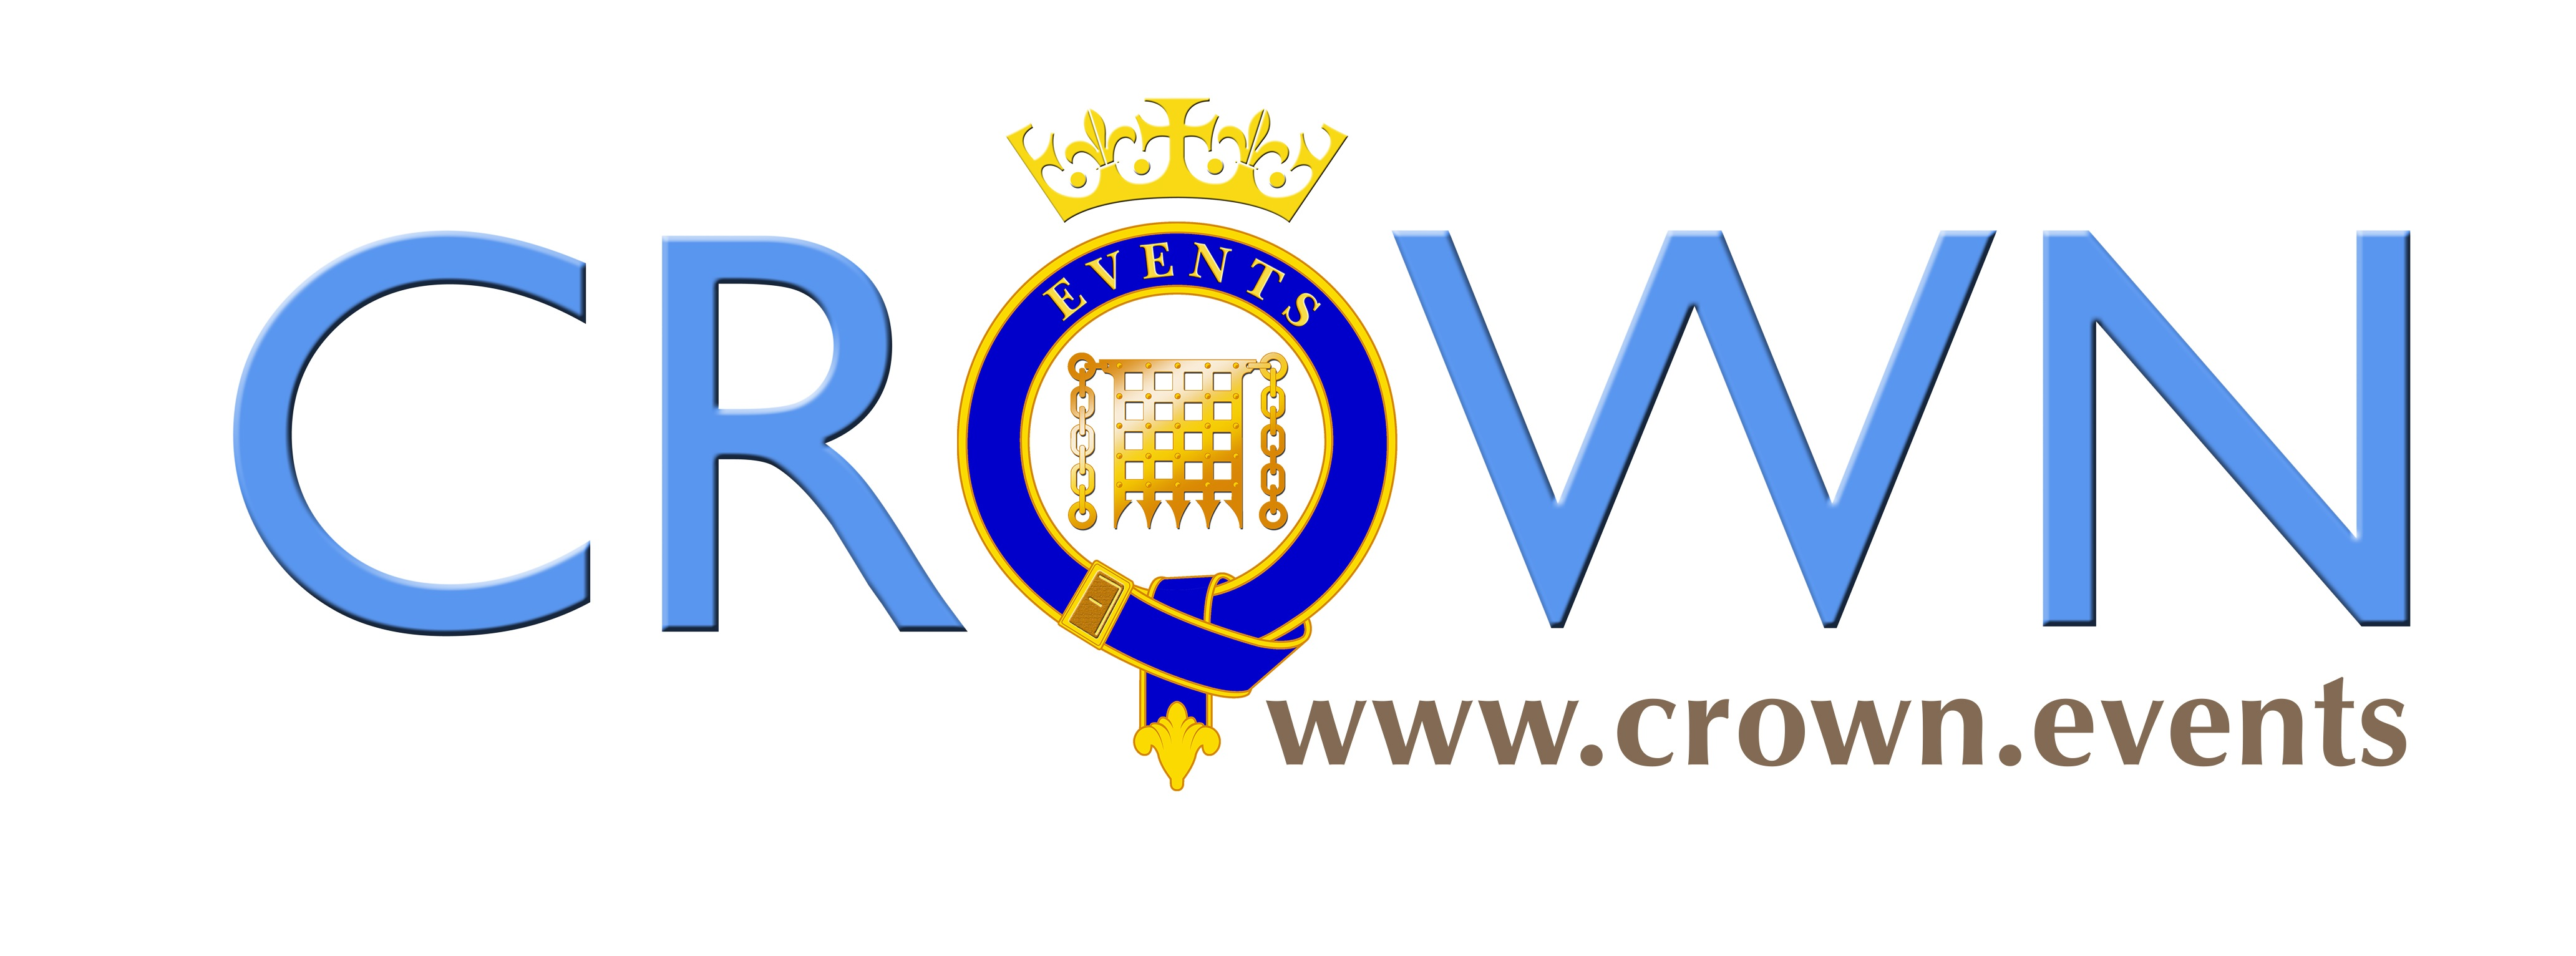 Crown Events Website